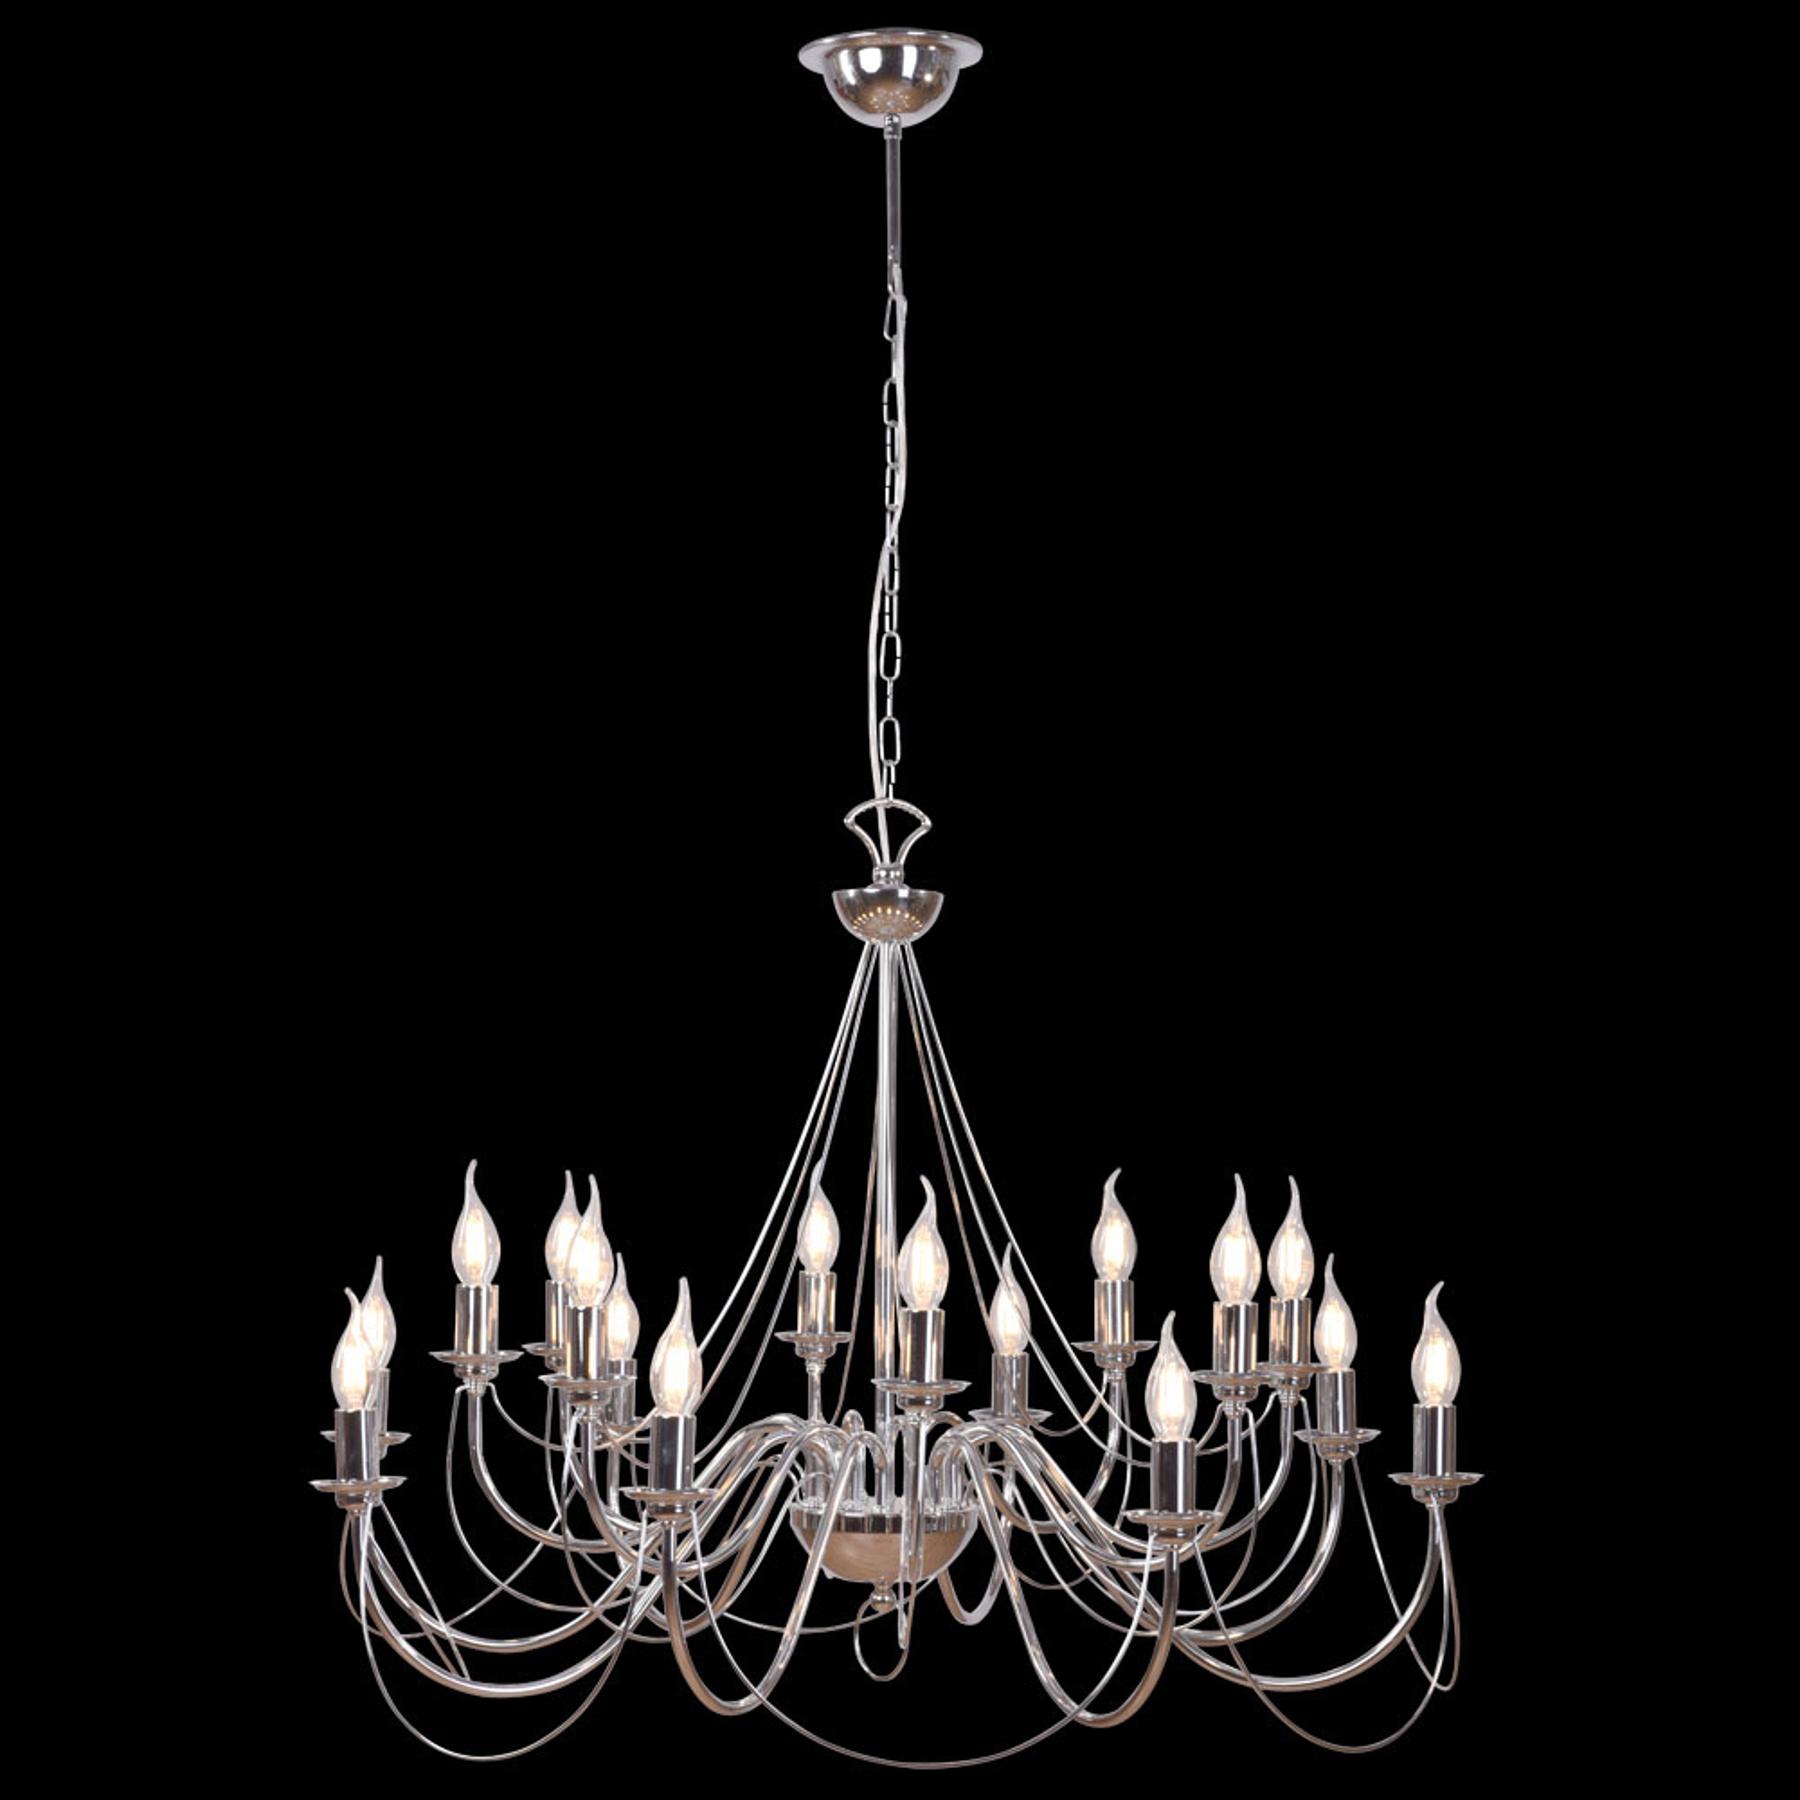 Kroonluchter Retro, 16-lamps, chroom